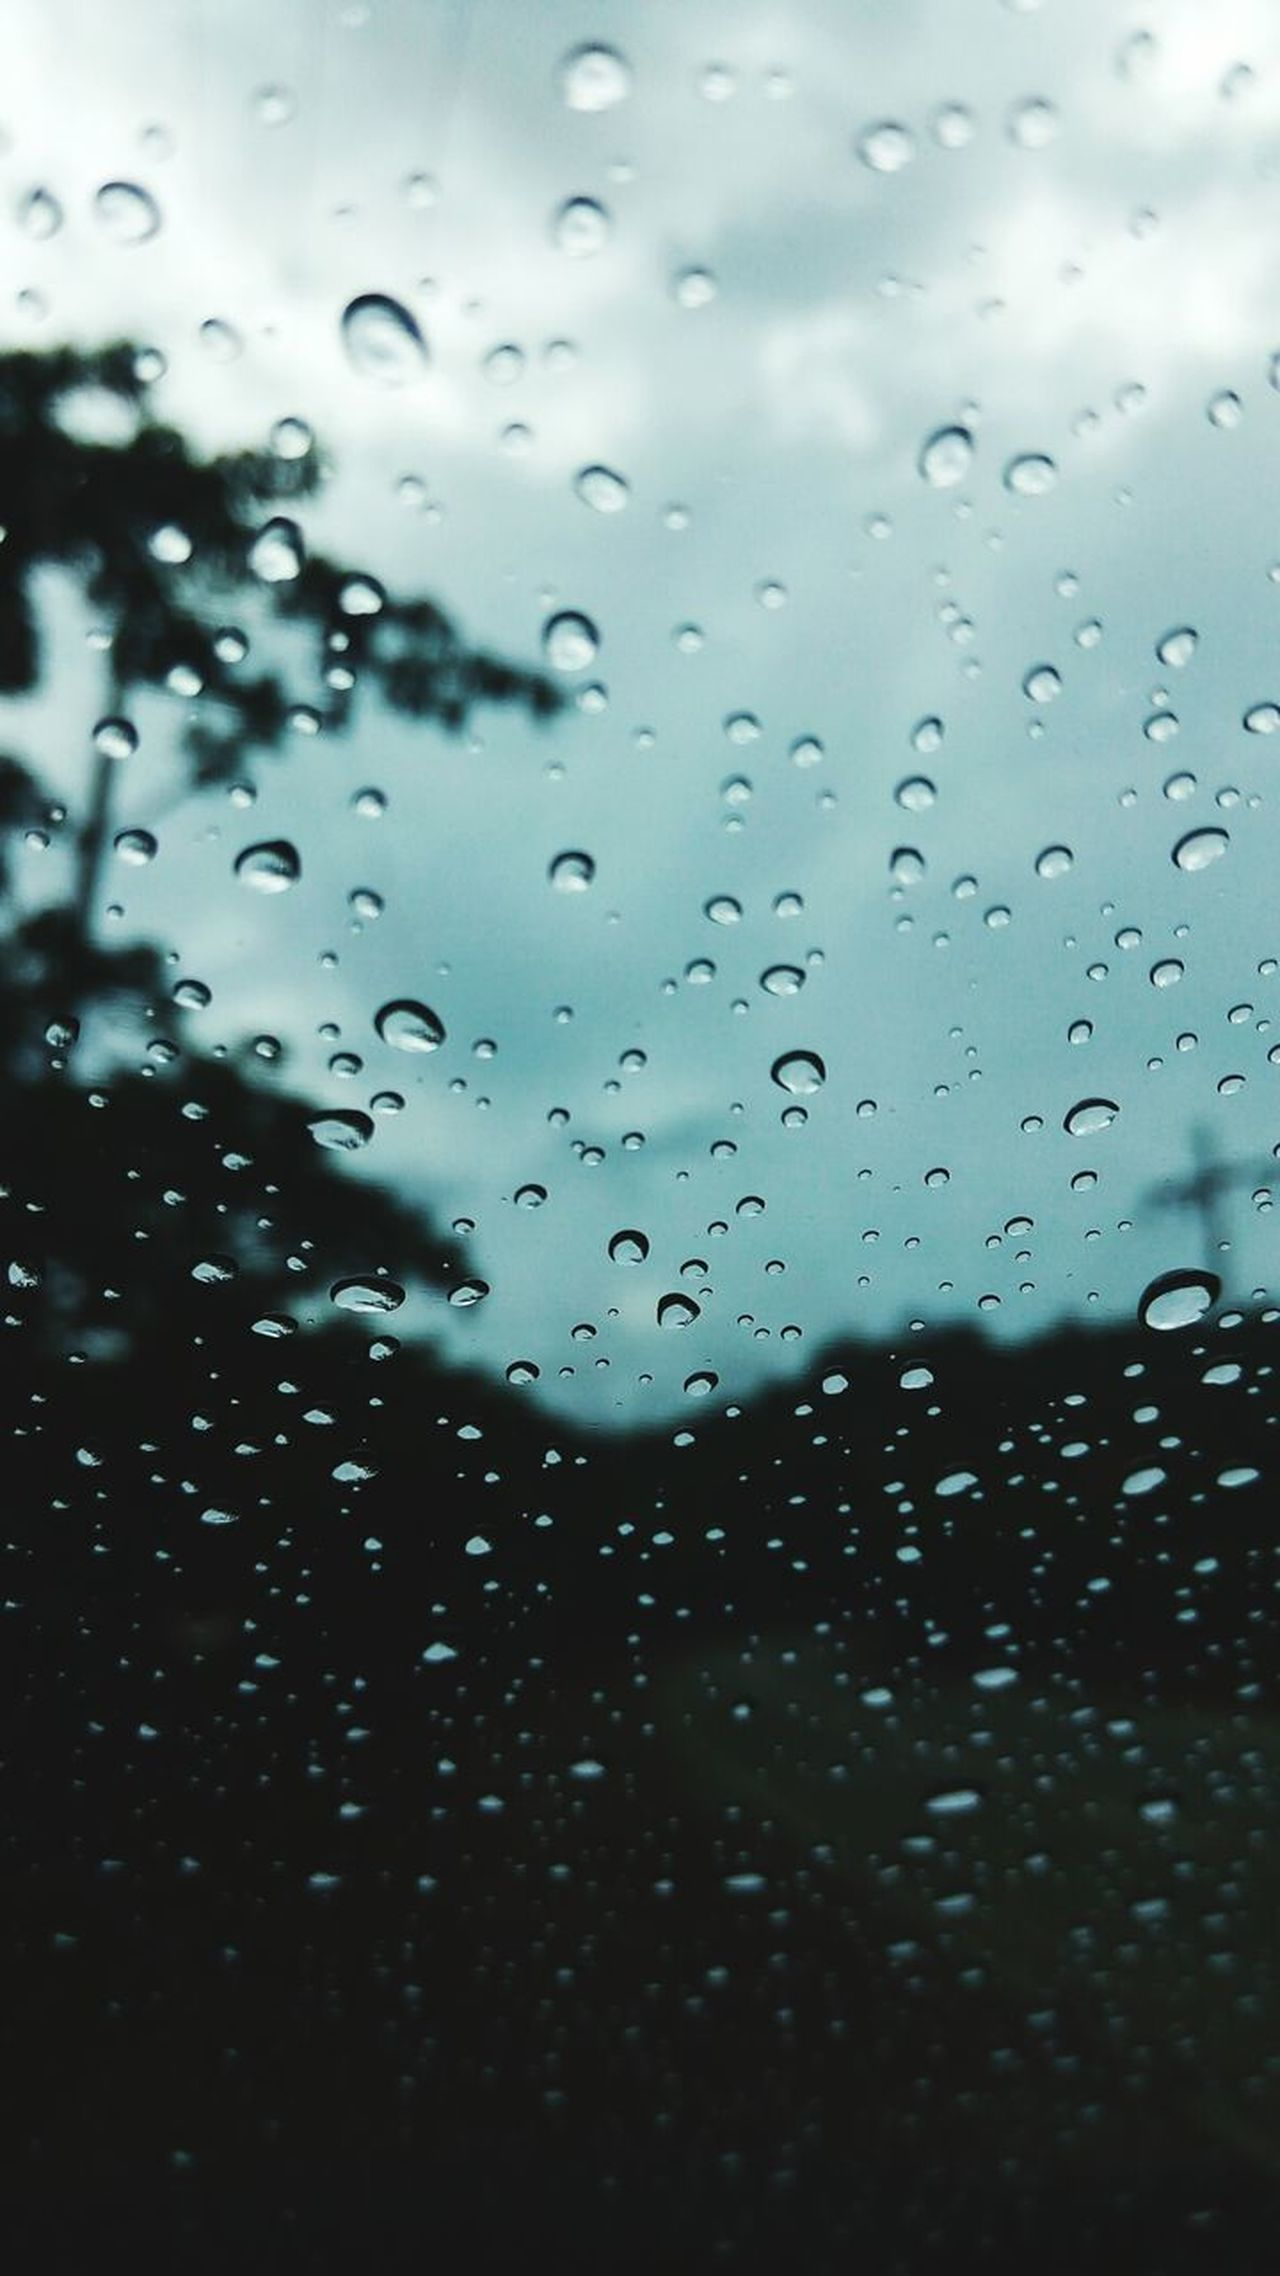 Window Drop No People Water Wet RainDrop Defocused Rainy Days RainDrop Rain Raindrops On My Window Windowraindrops Nature Sky Car Window Rain Focus On Rain Drops Relax Travel